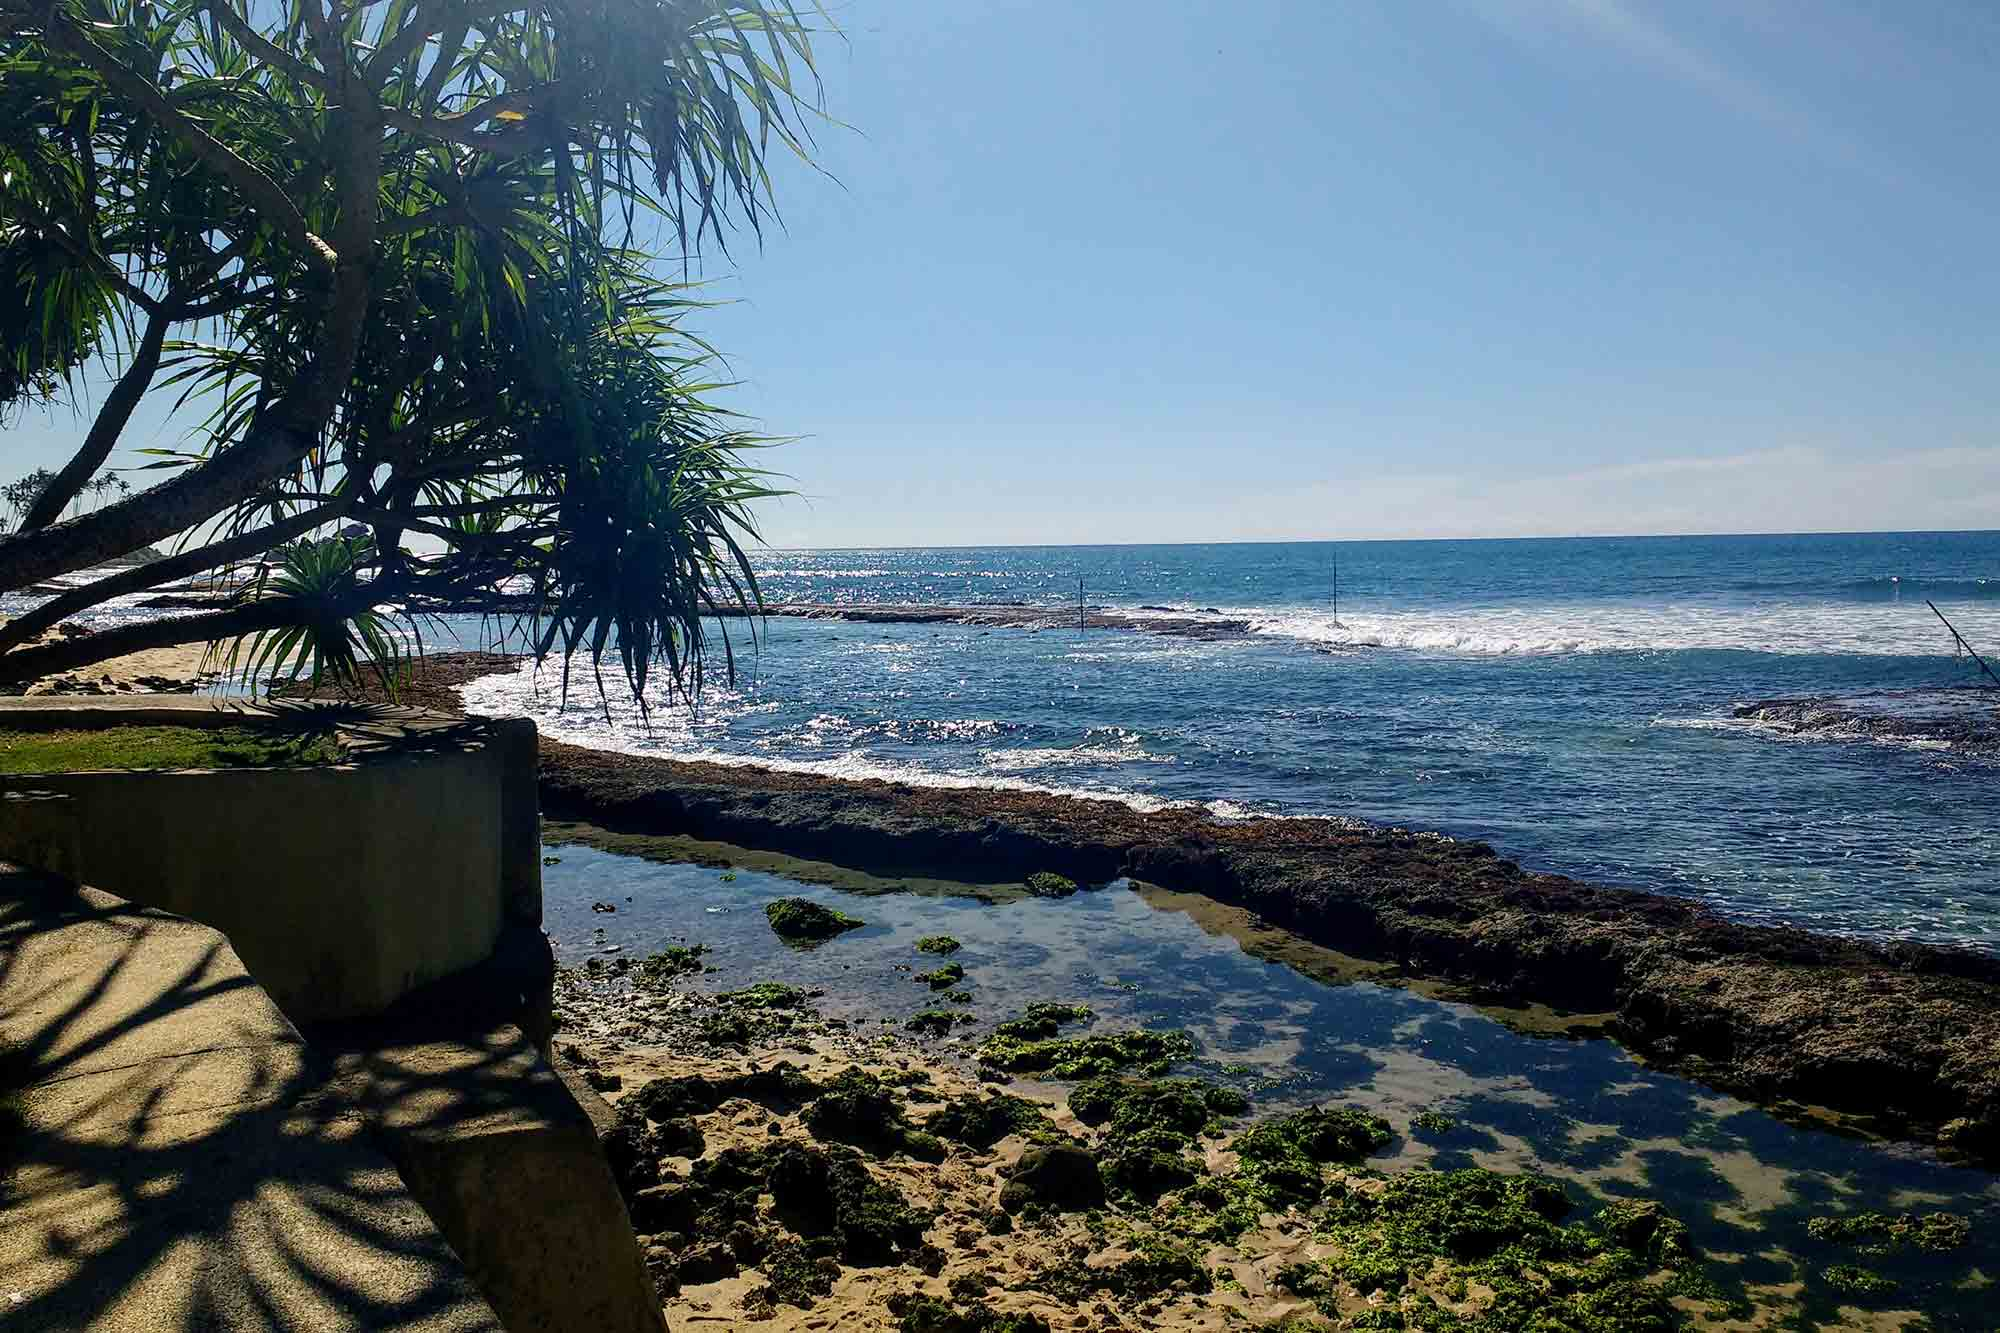 https://www.soulandsurf.com/wp-content/uploads/2021/08/Lanka-Guide-Images-gurubablia-reef.jpg